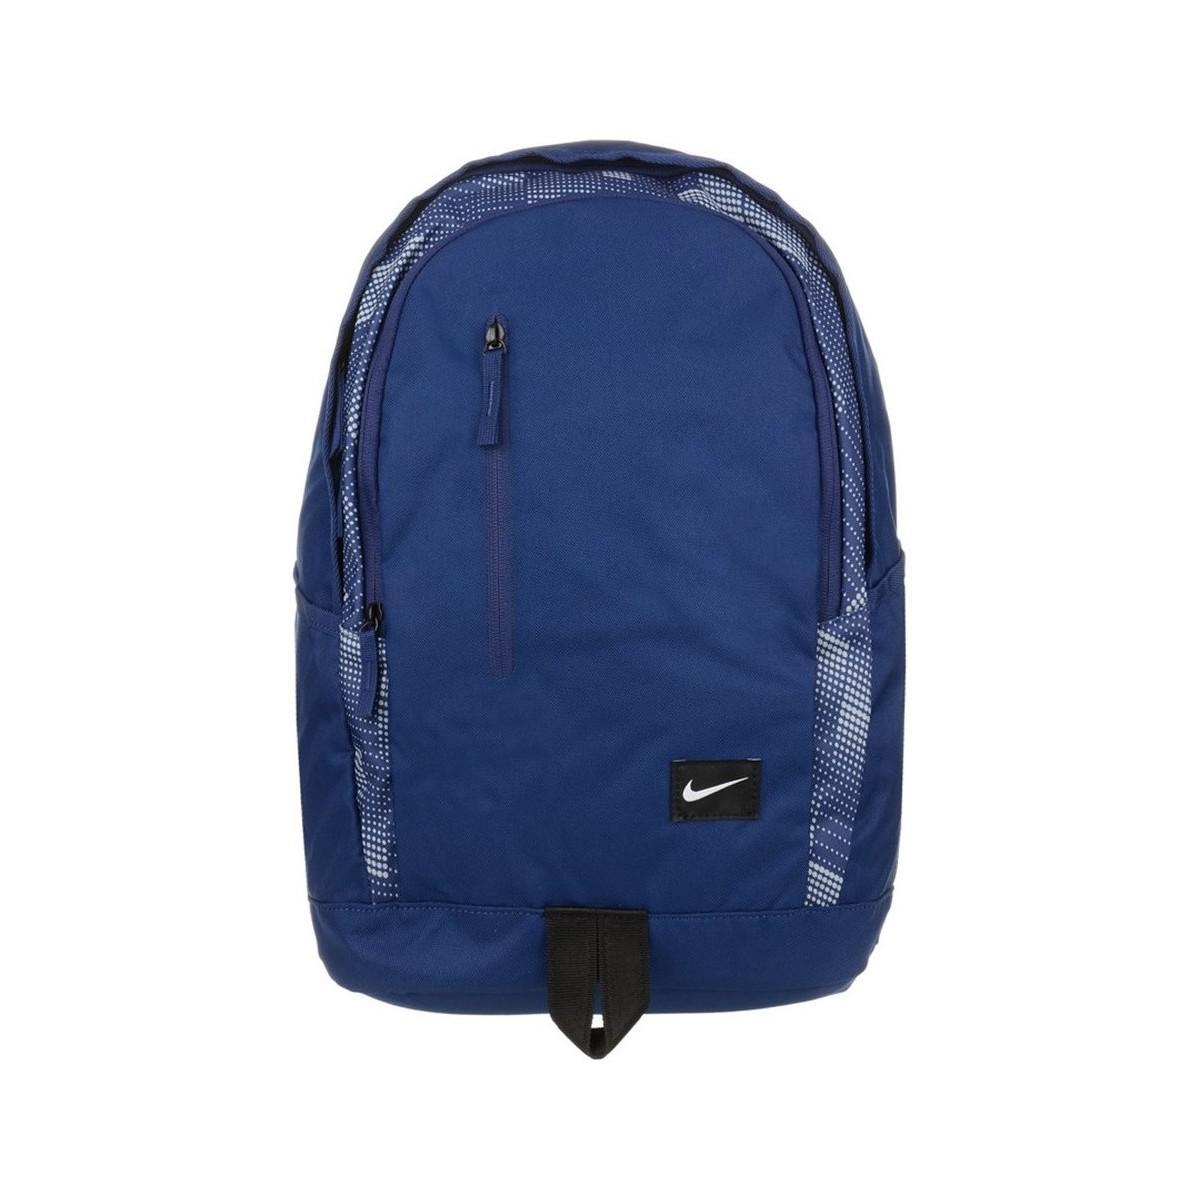 70c6ddffde78c Nike All Access Soleday Men s Backpack In Blue in Blue for Men - Lyst